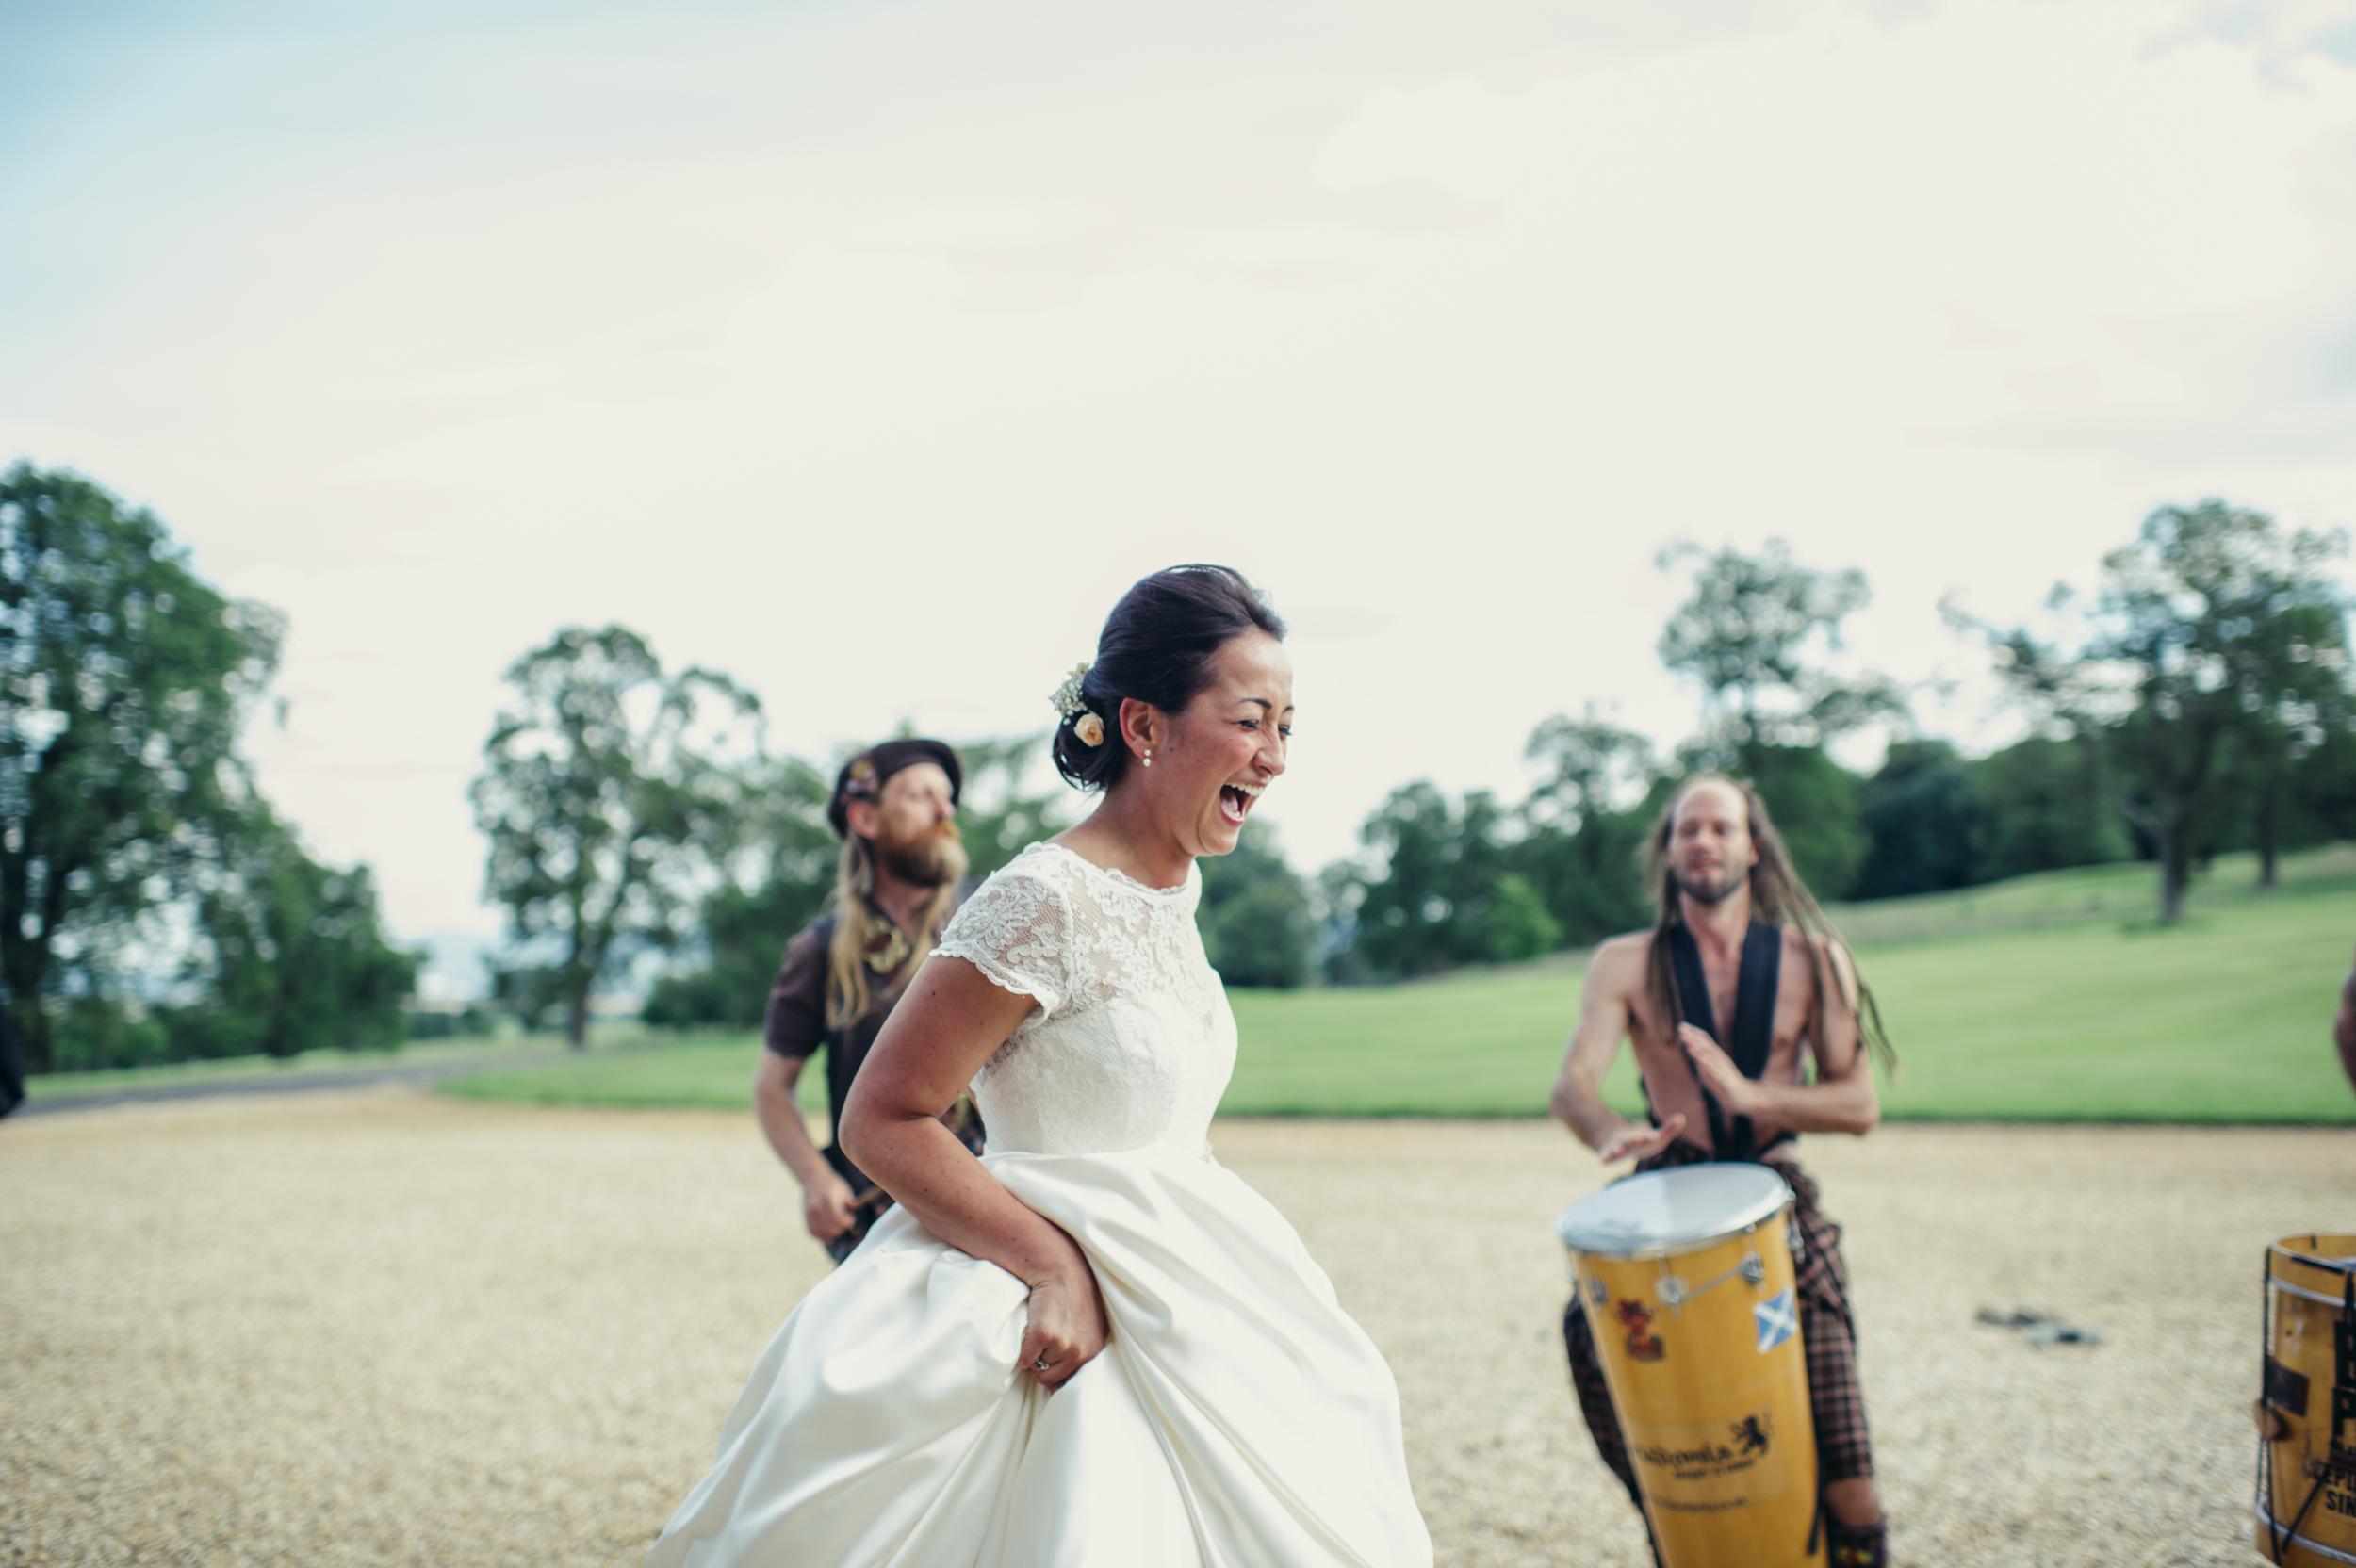 0140-lisa-devine-alternative-creative-wedding-photography-glasgow-edinburgh.JPG